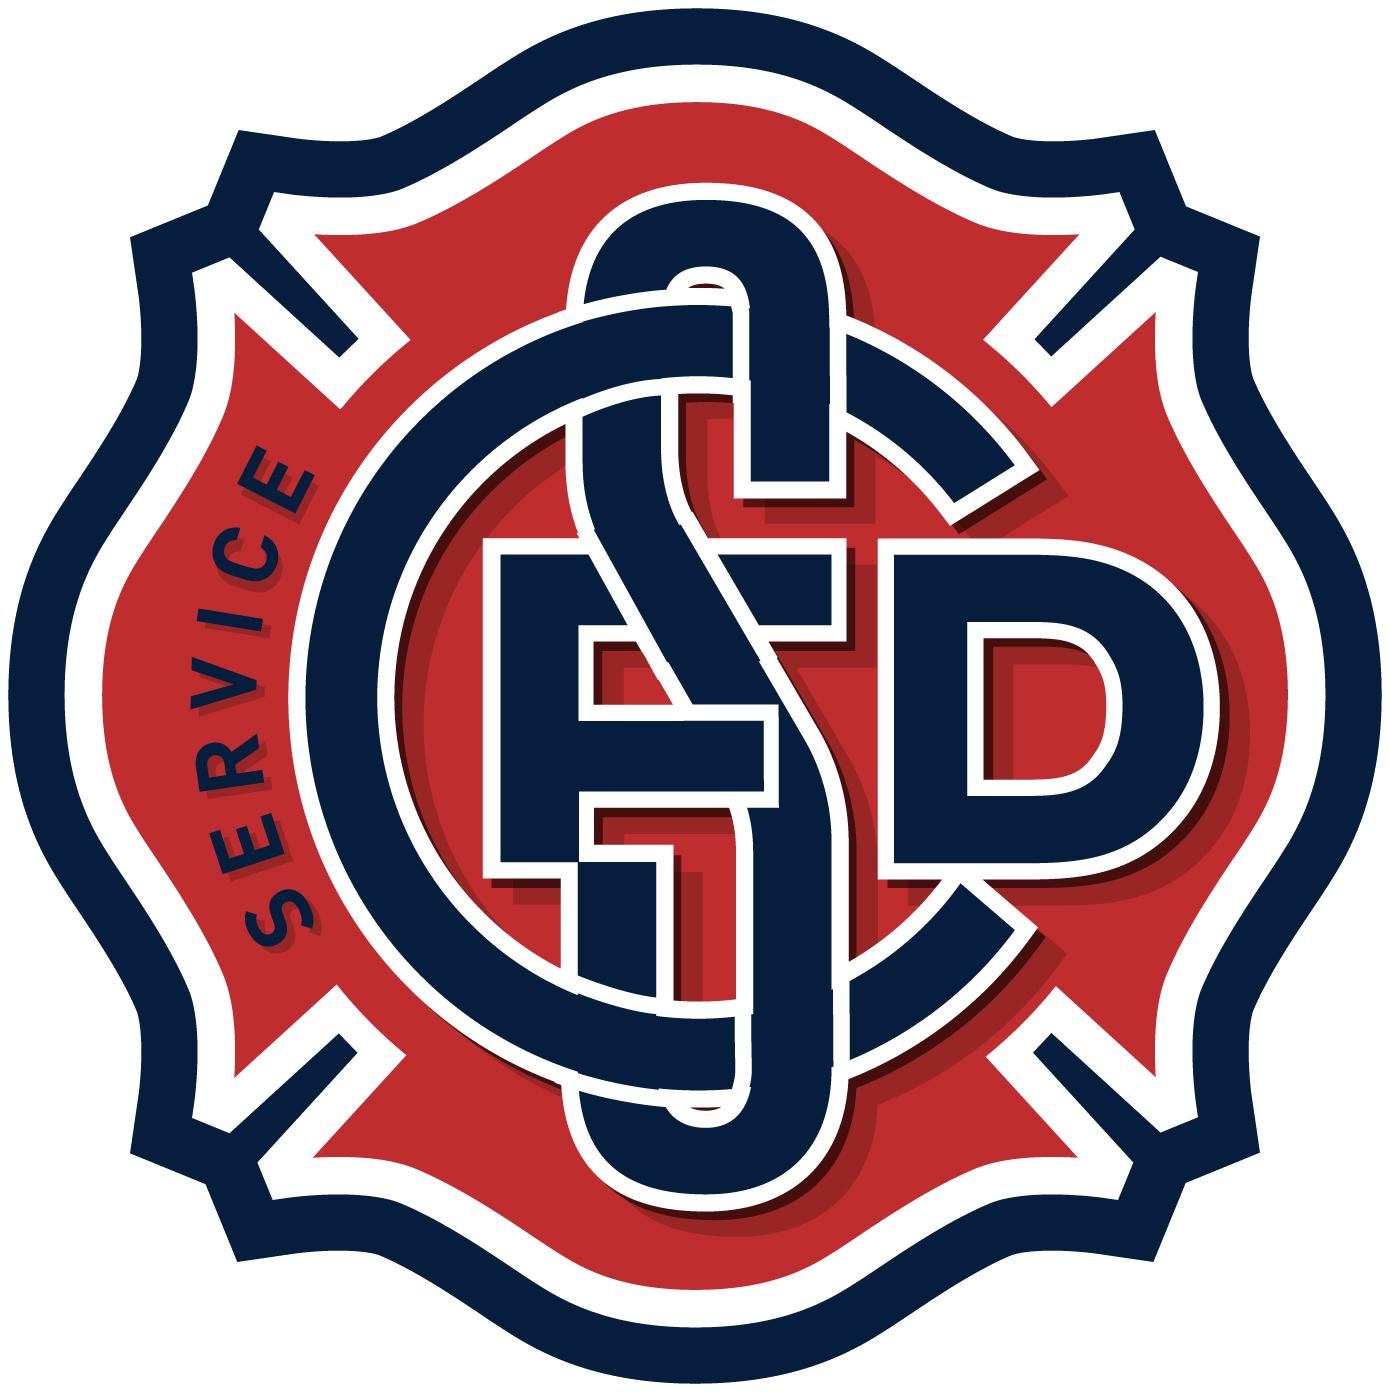 Silver Creek Fire Department.